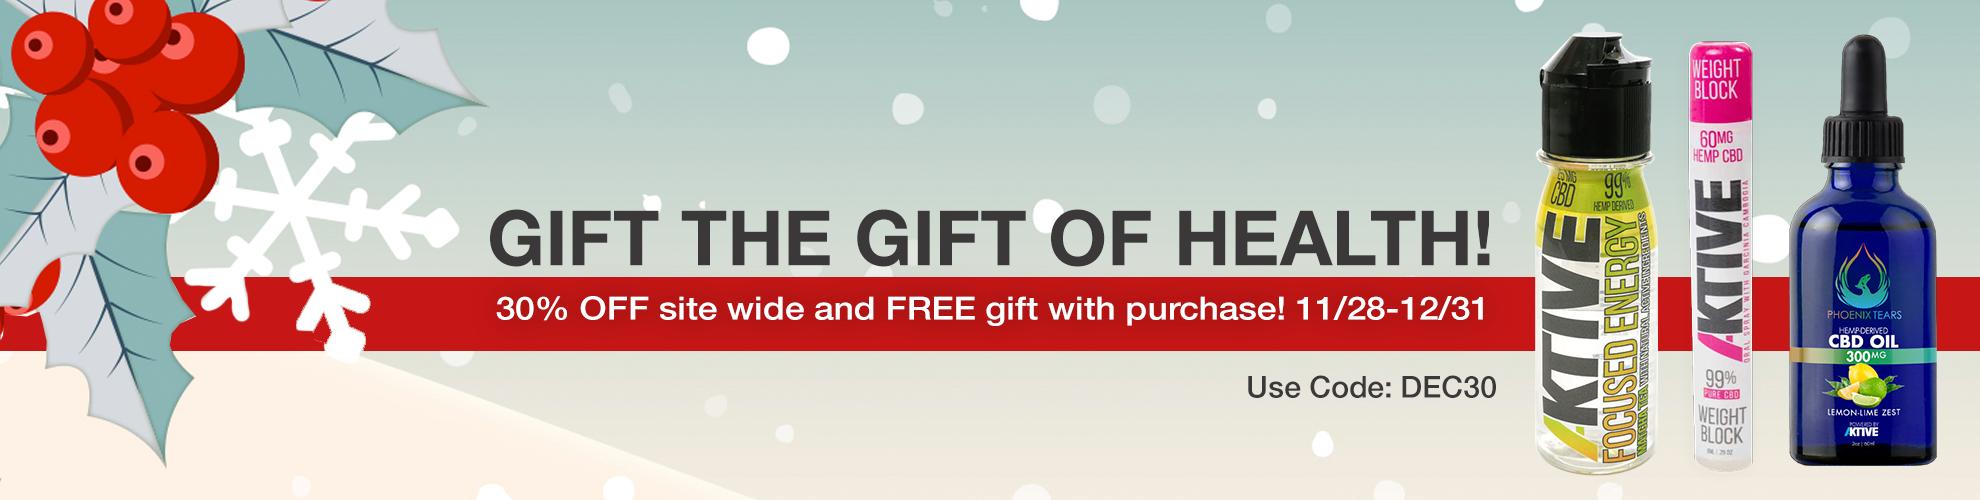 holiday_aktive_shop_banner